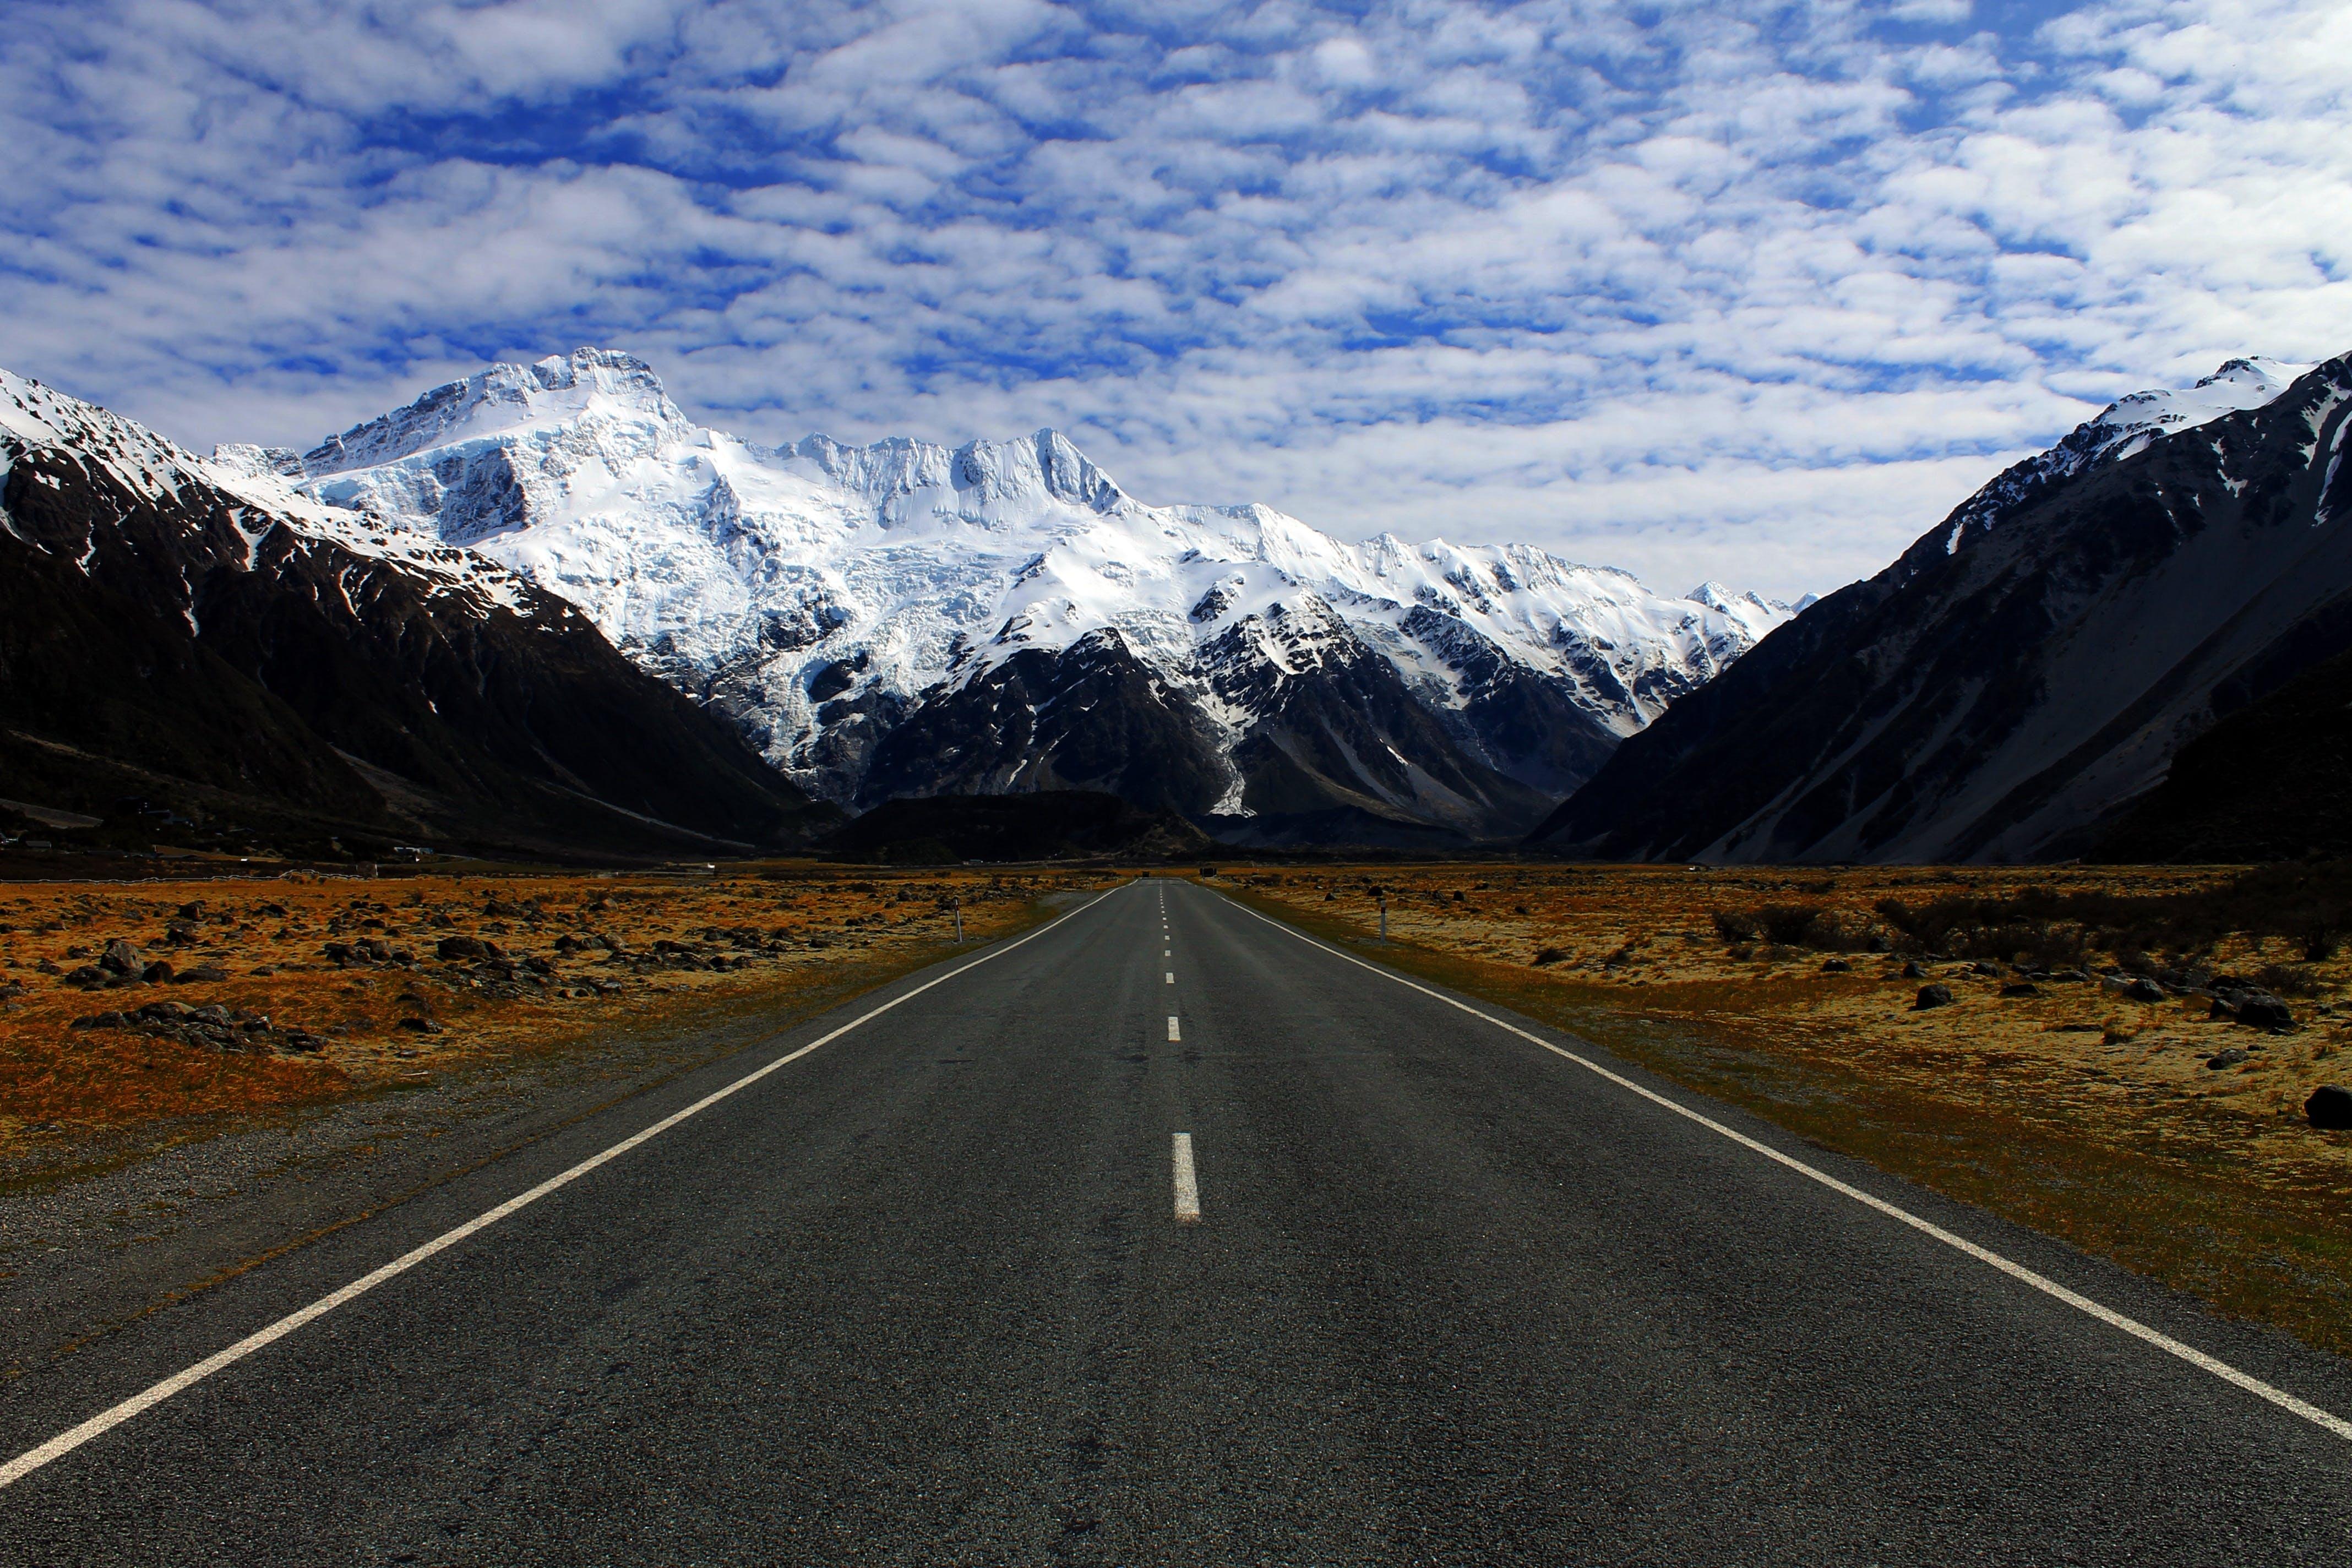 adventure, altitude, asphalt